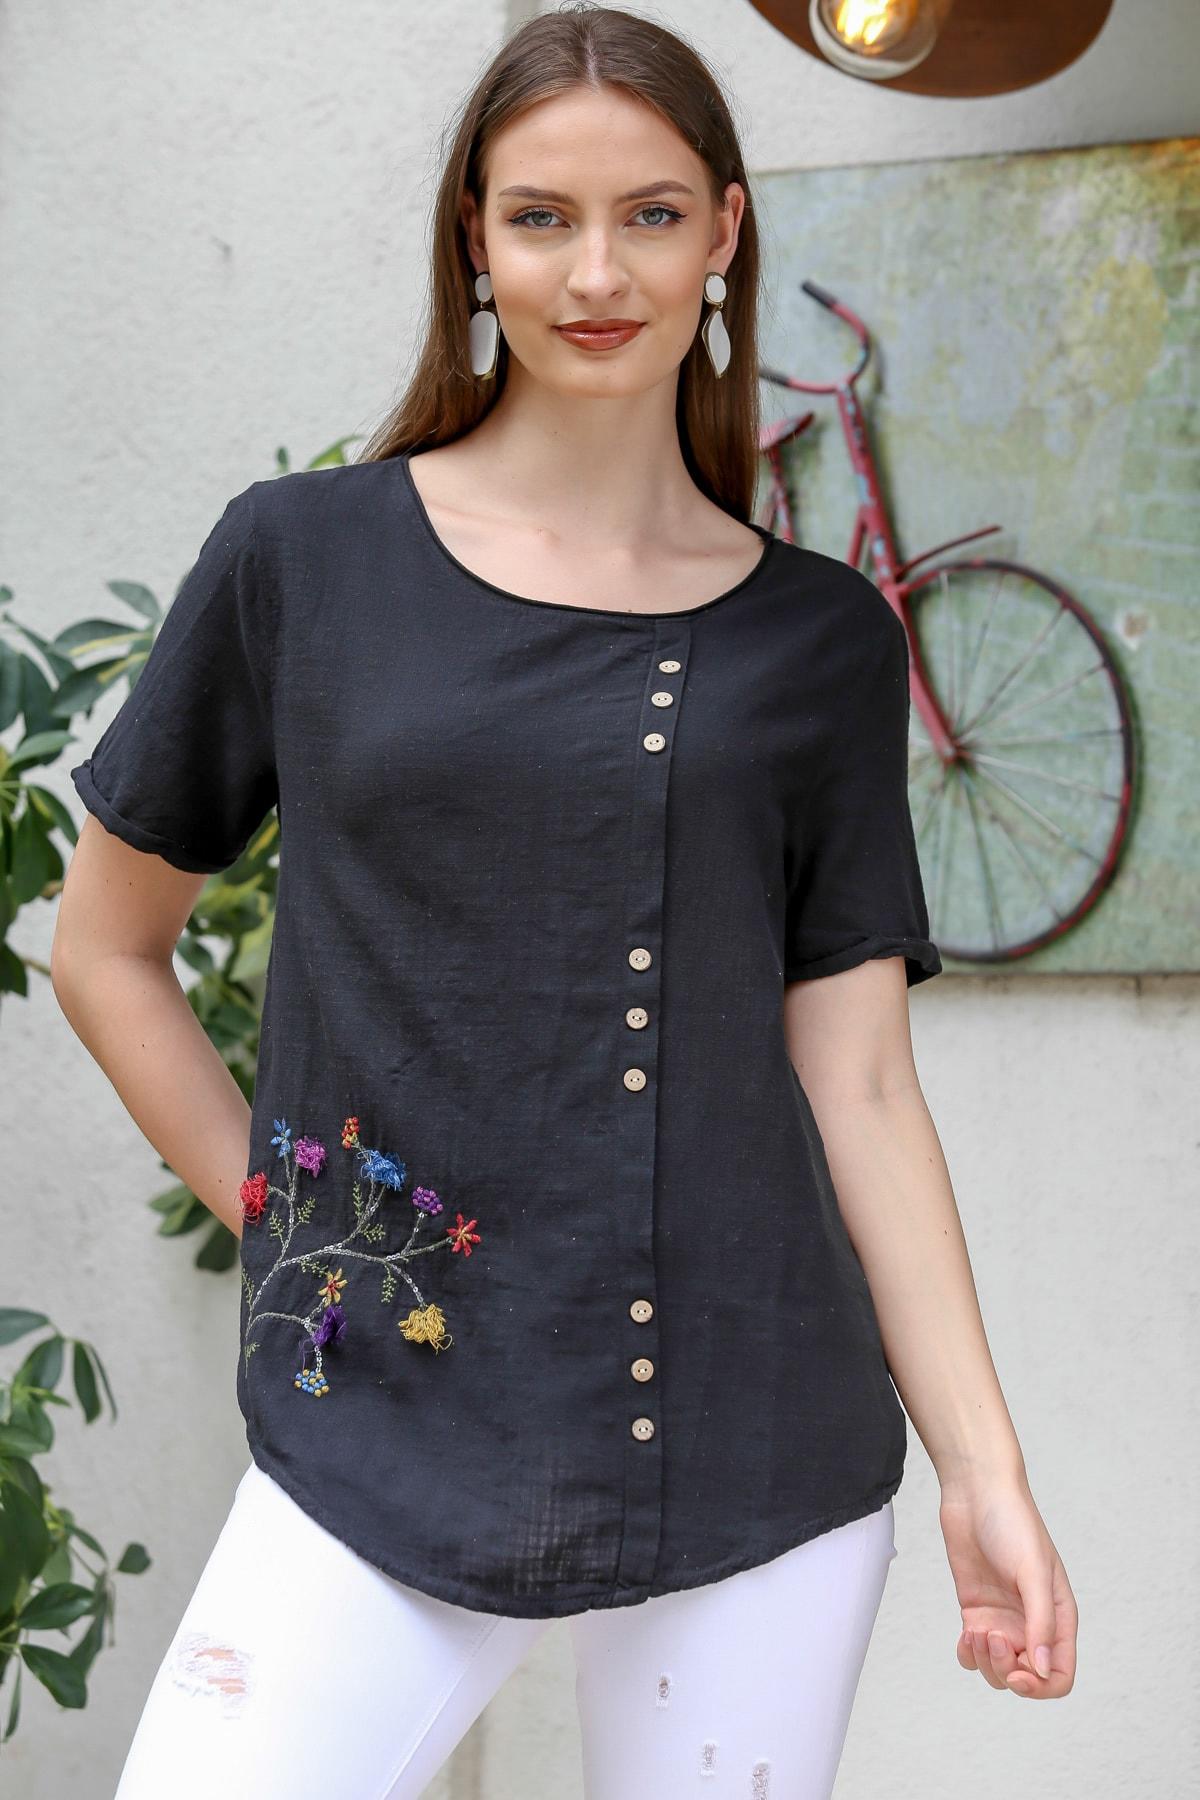 Chiccy Kadın Siyah Çiçek Buketi 3D Nakışlı Düğme Detaylı Salaş Dokuma Bluz M10010200BL95280 0